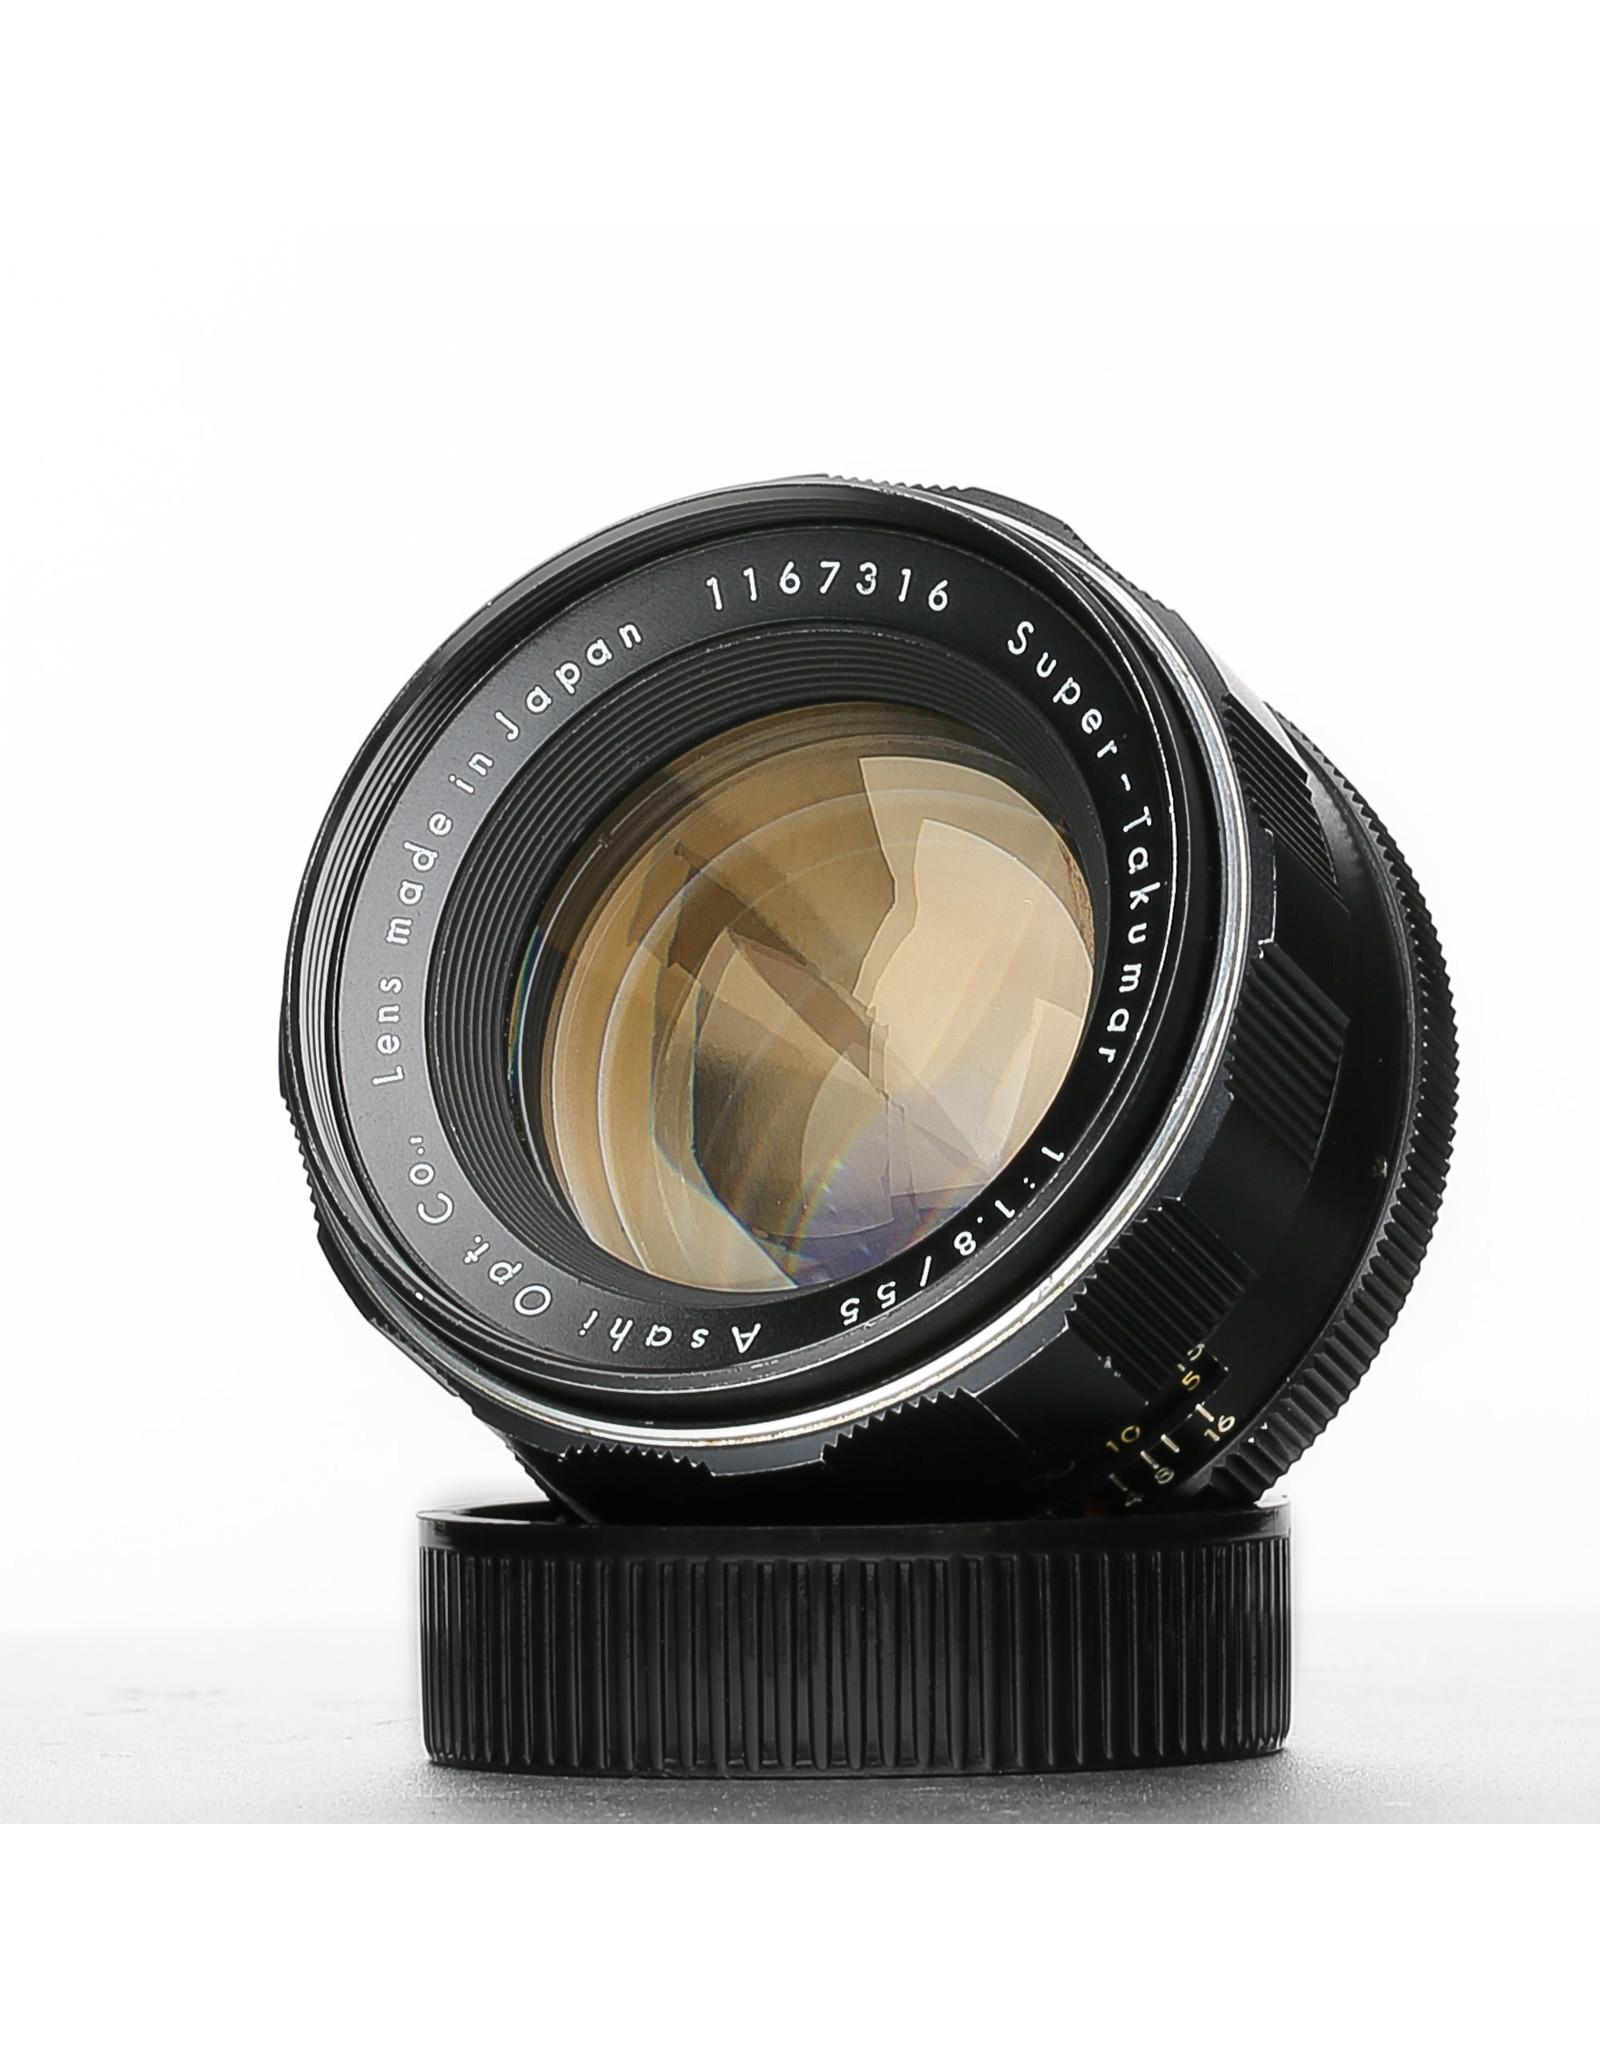 Pentax Pentax Super Takumar 55mm f1.8 M42 Lens